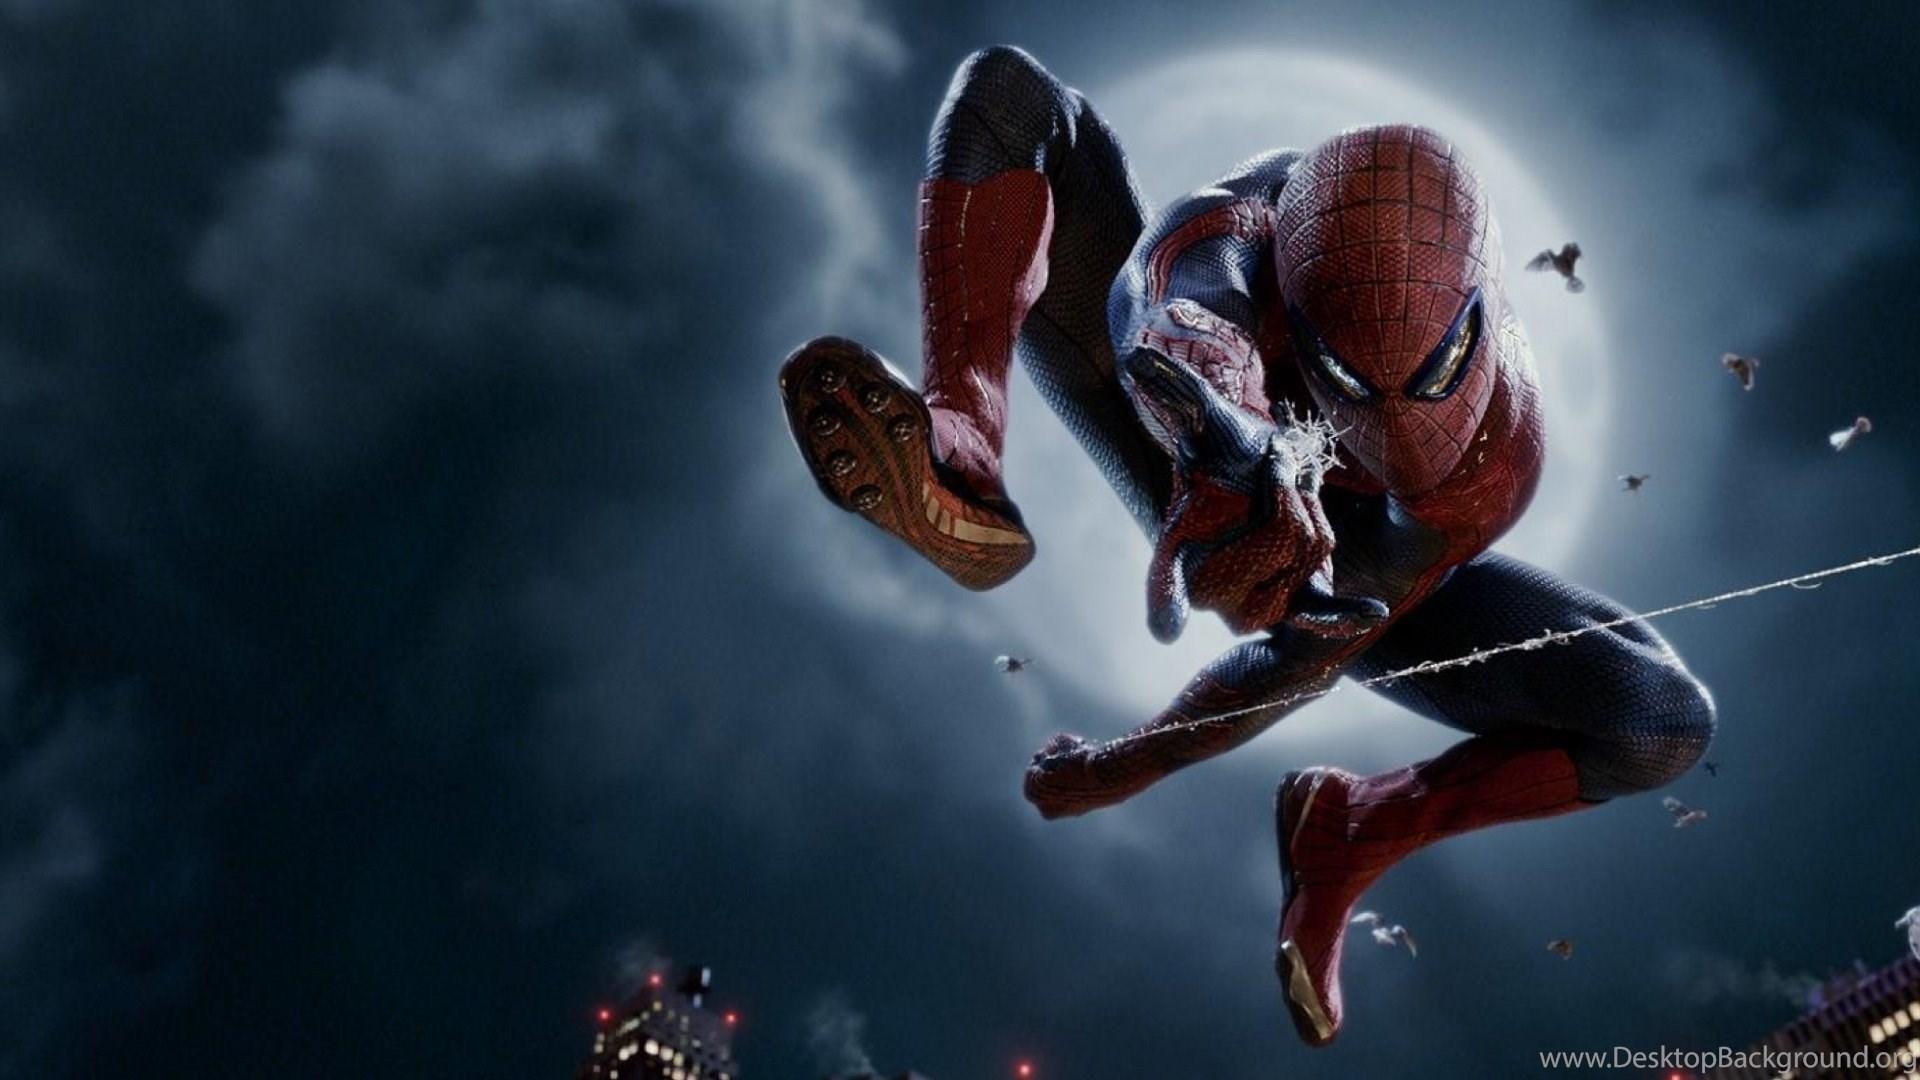 HD Spiderman Superhero Wallpaper Backgrounds Full Size Desktop